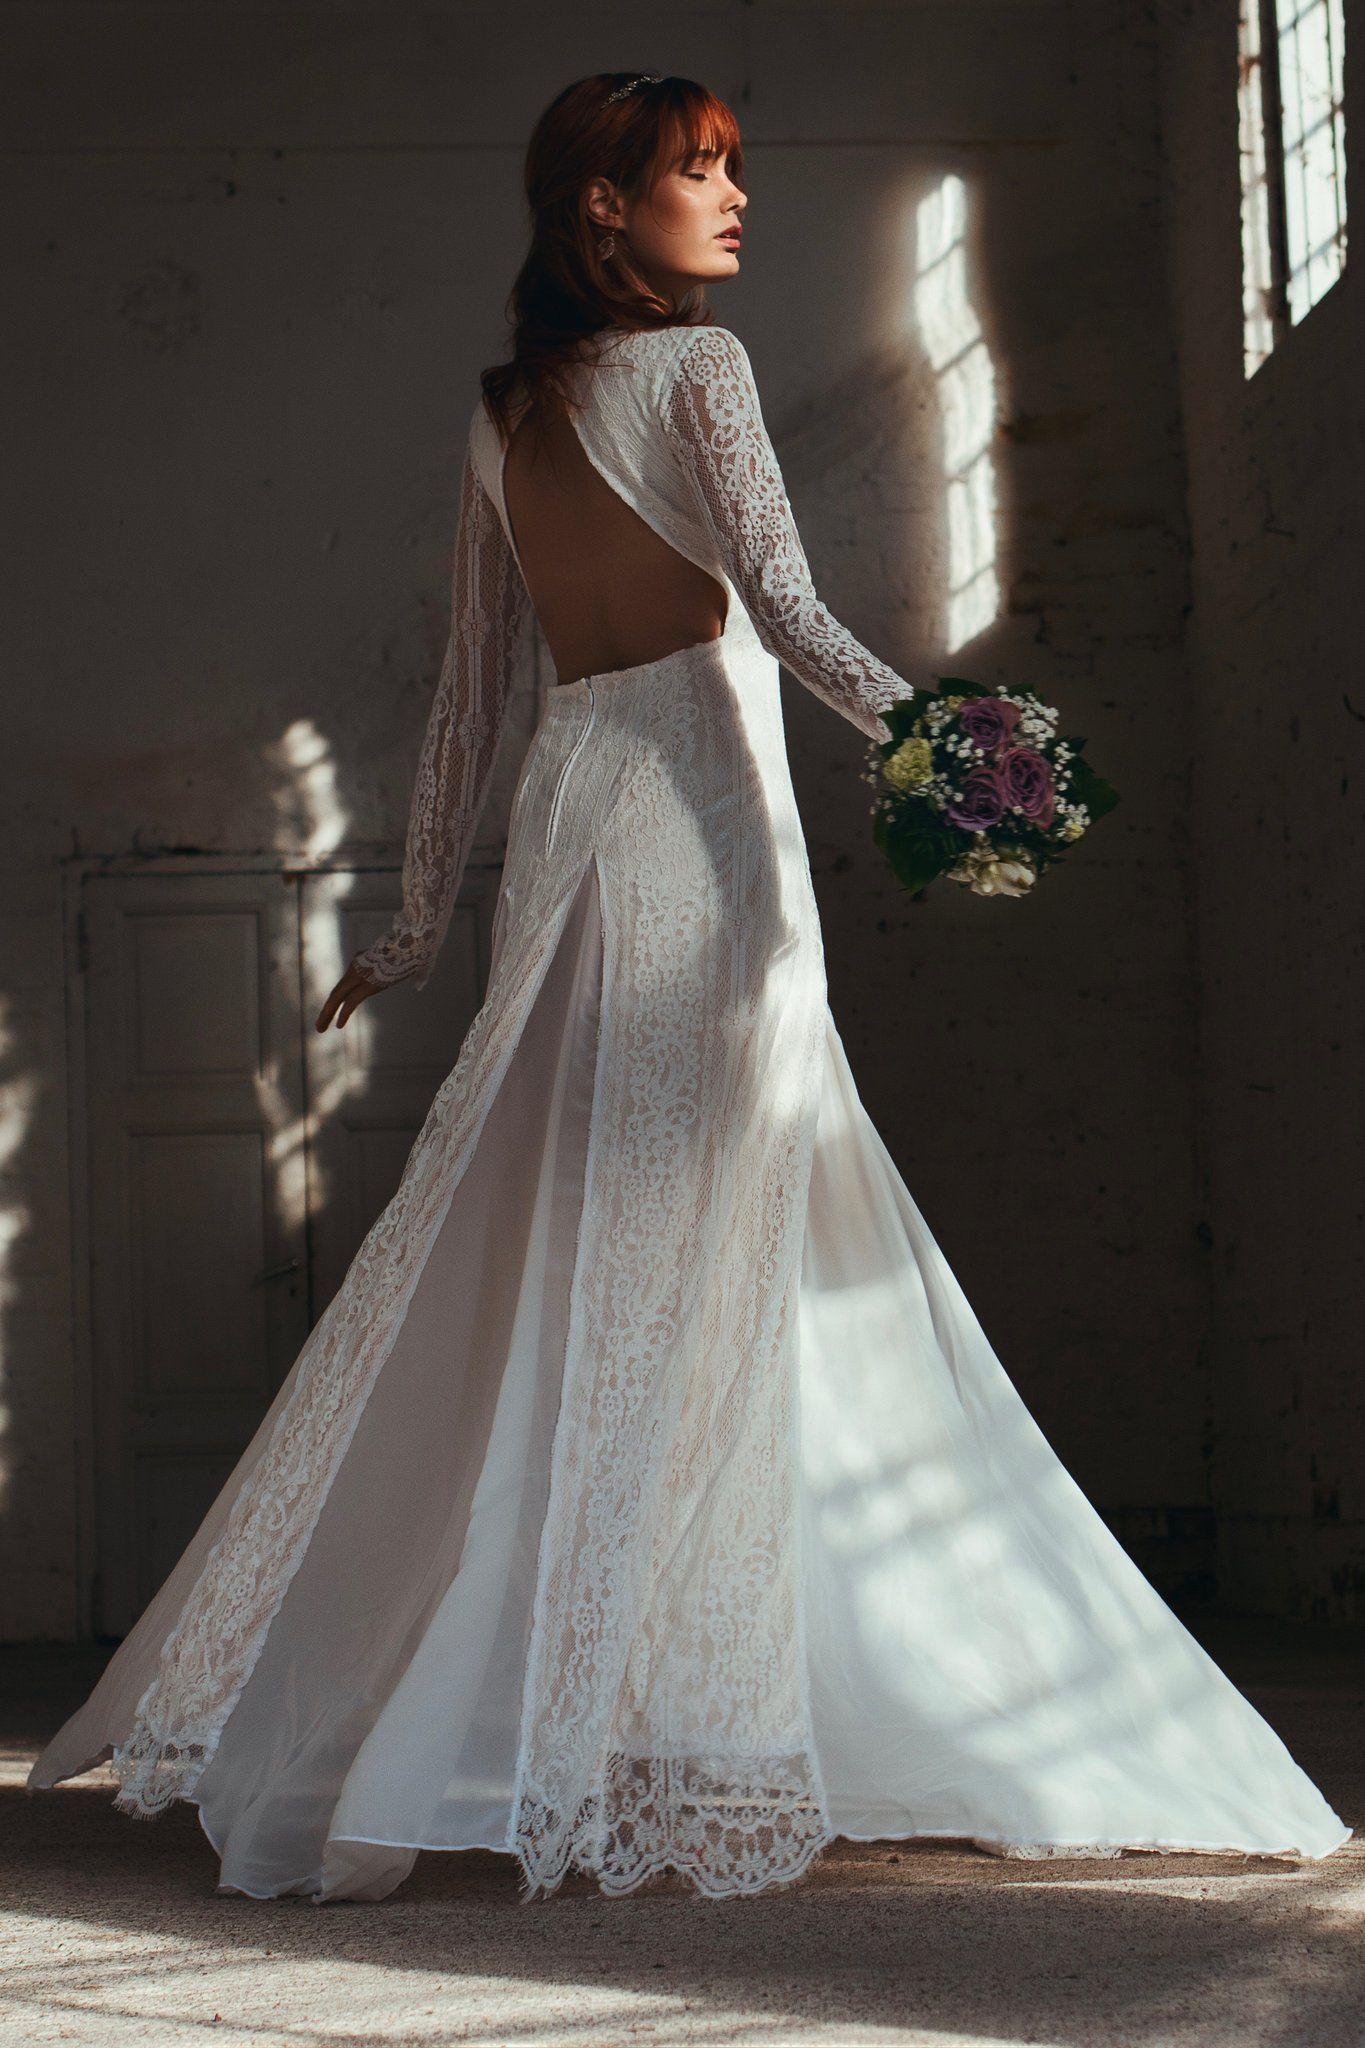 Boho wedding dress with sleeves  Bohemian wedding dress boho beach wedding dress from